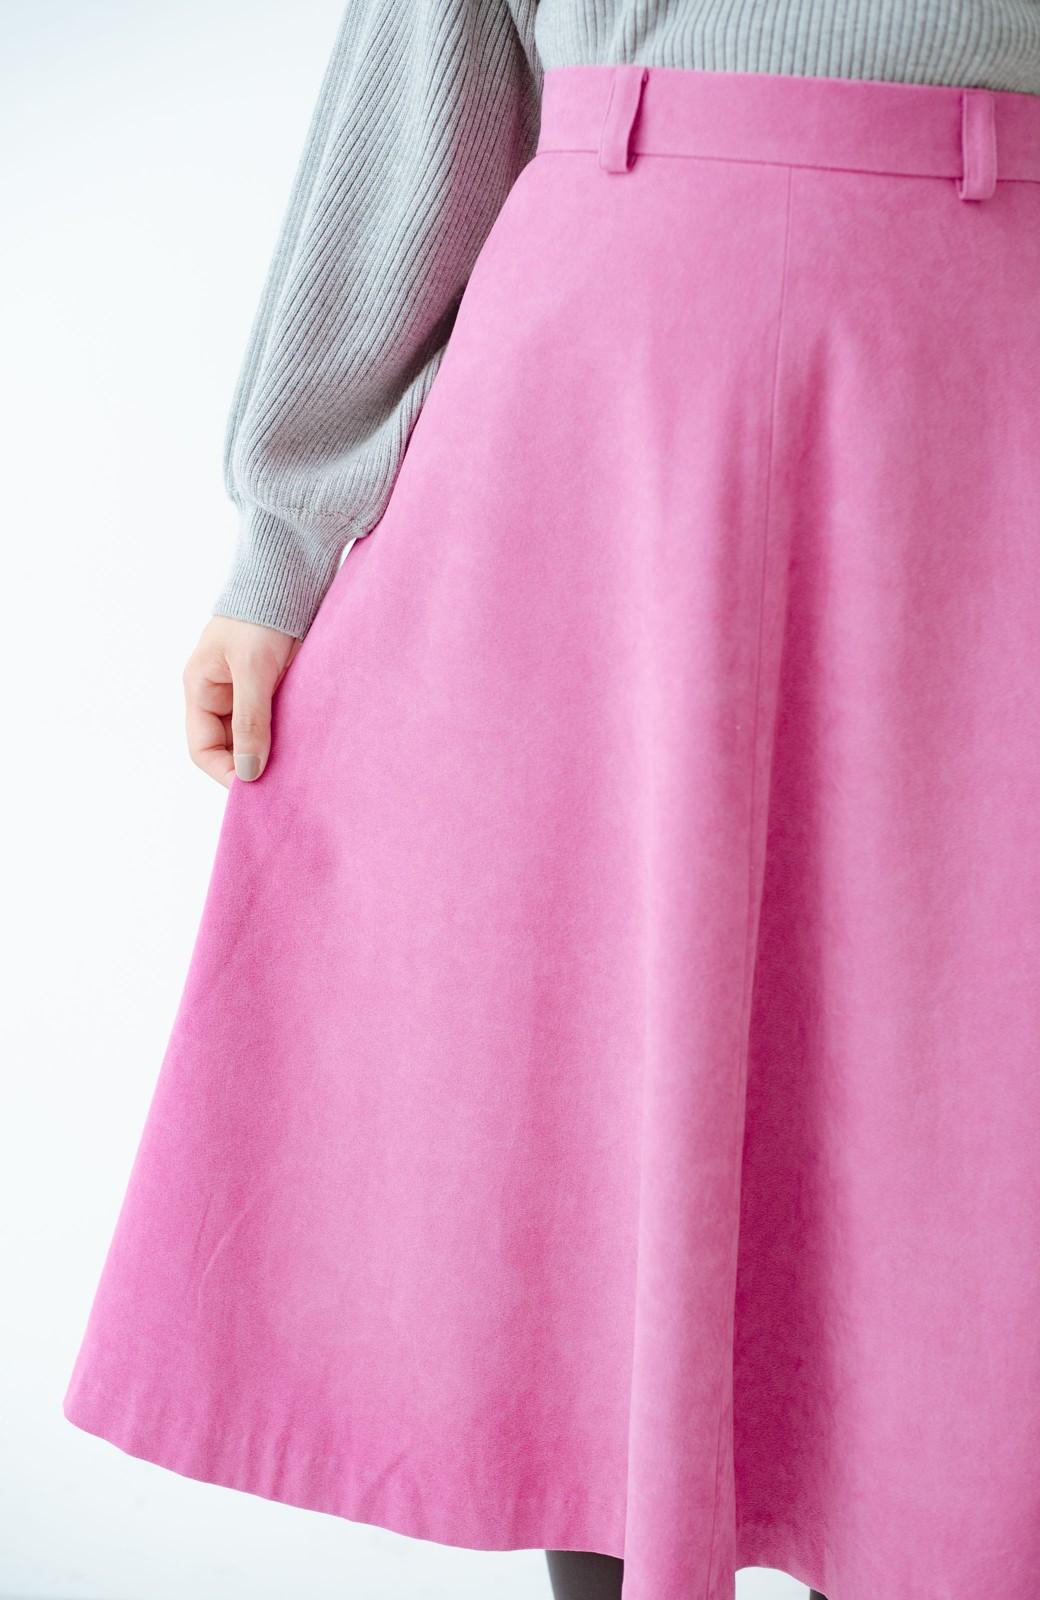 haco! 女っぽく上品に見える フレアースカート by que made me <ピンク>の商品写真6